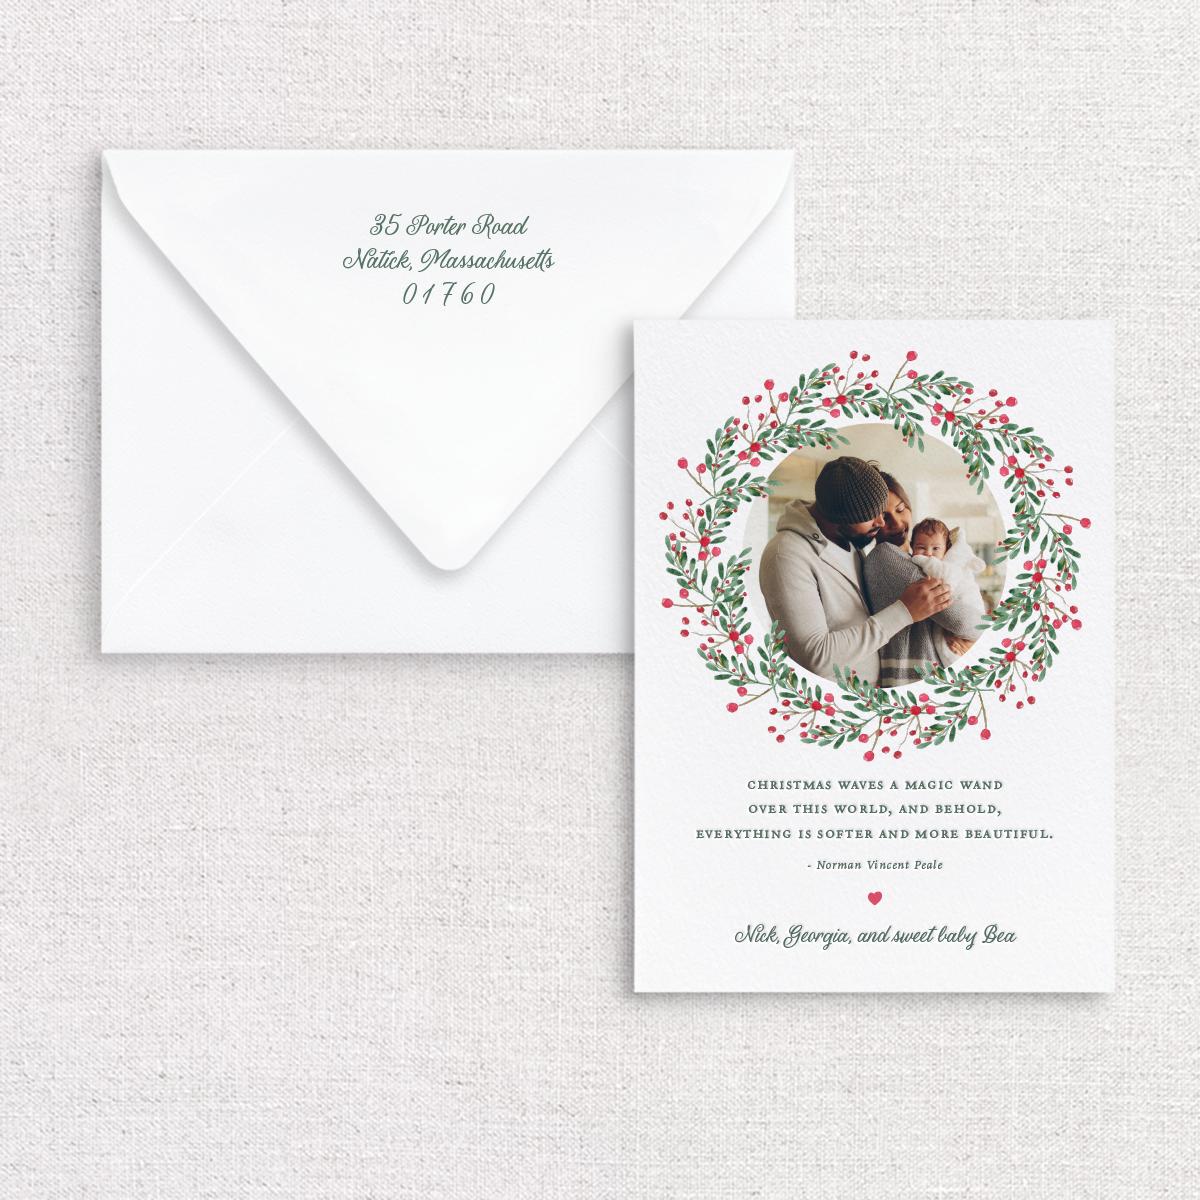 Gus and Ruby Letterpress - GR Wreath Photo Custom Holiday Card